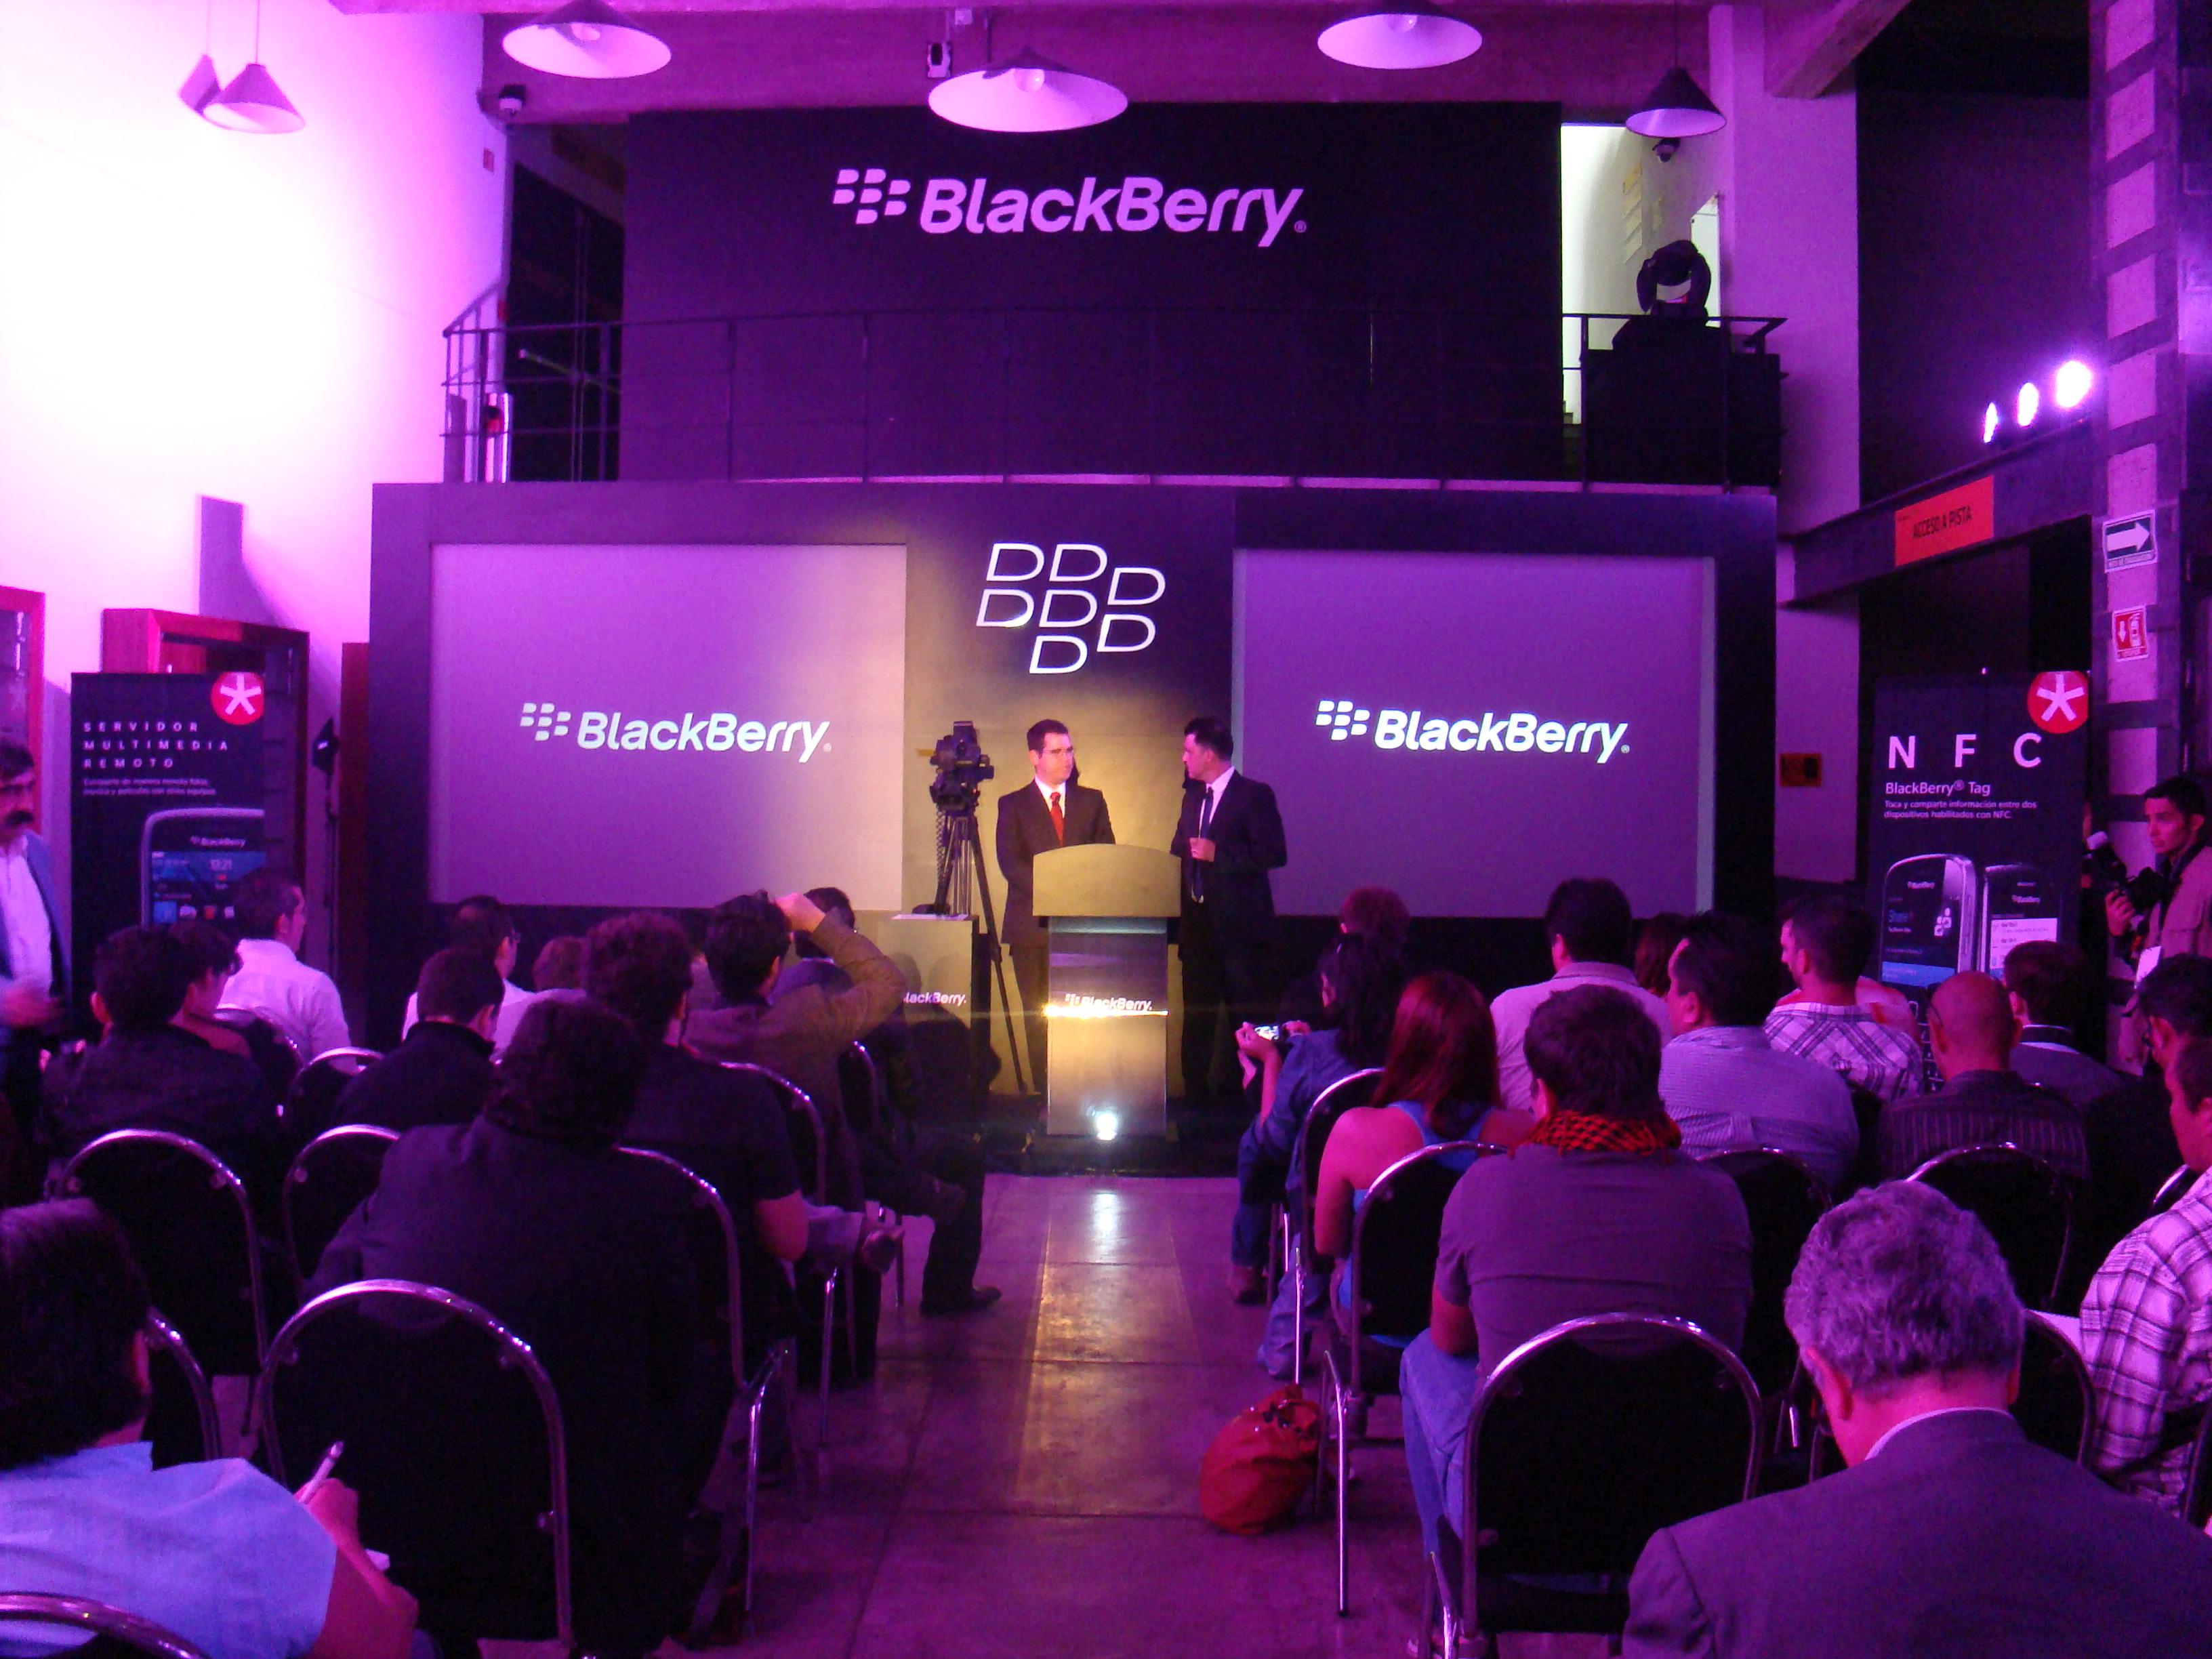 BlackBerry 10 6